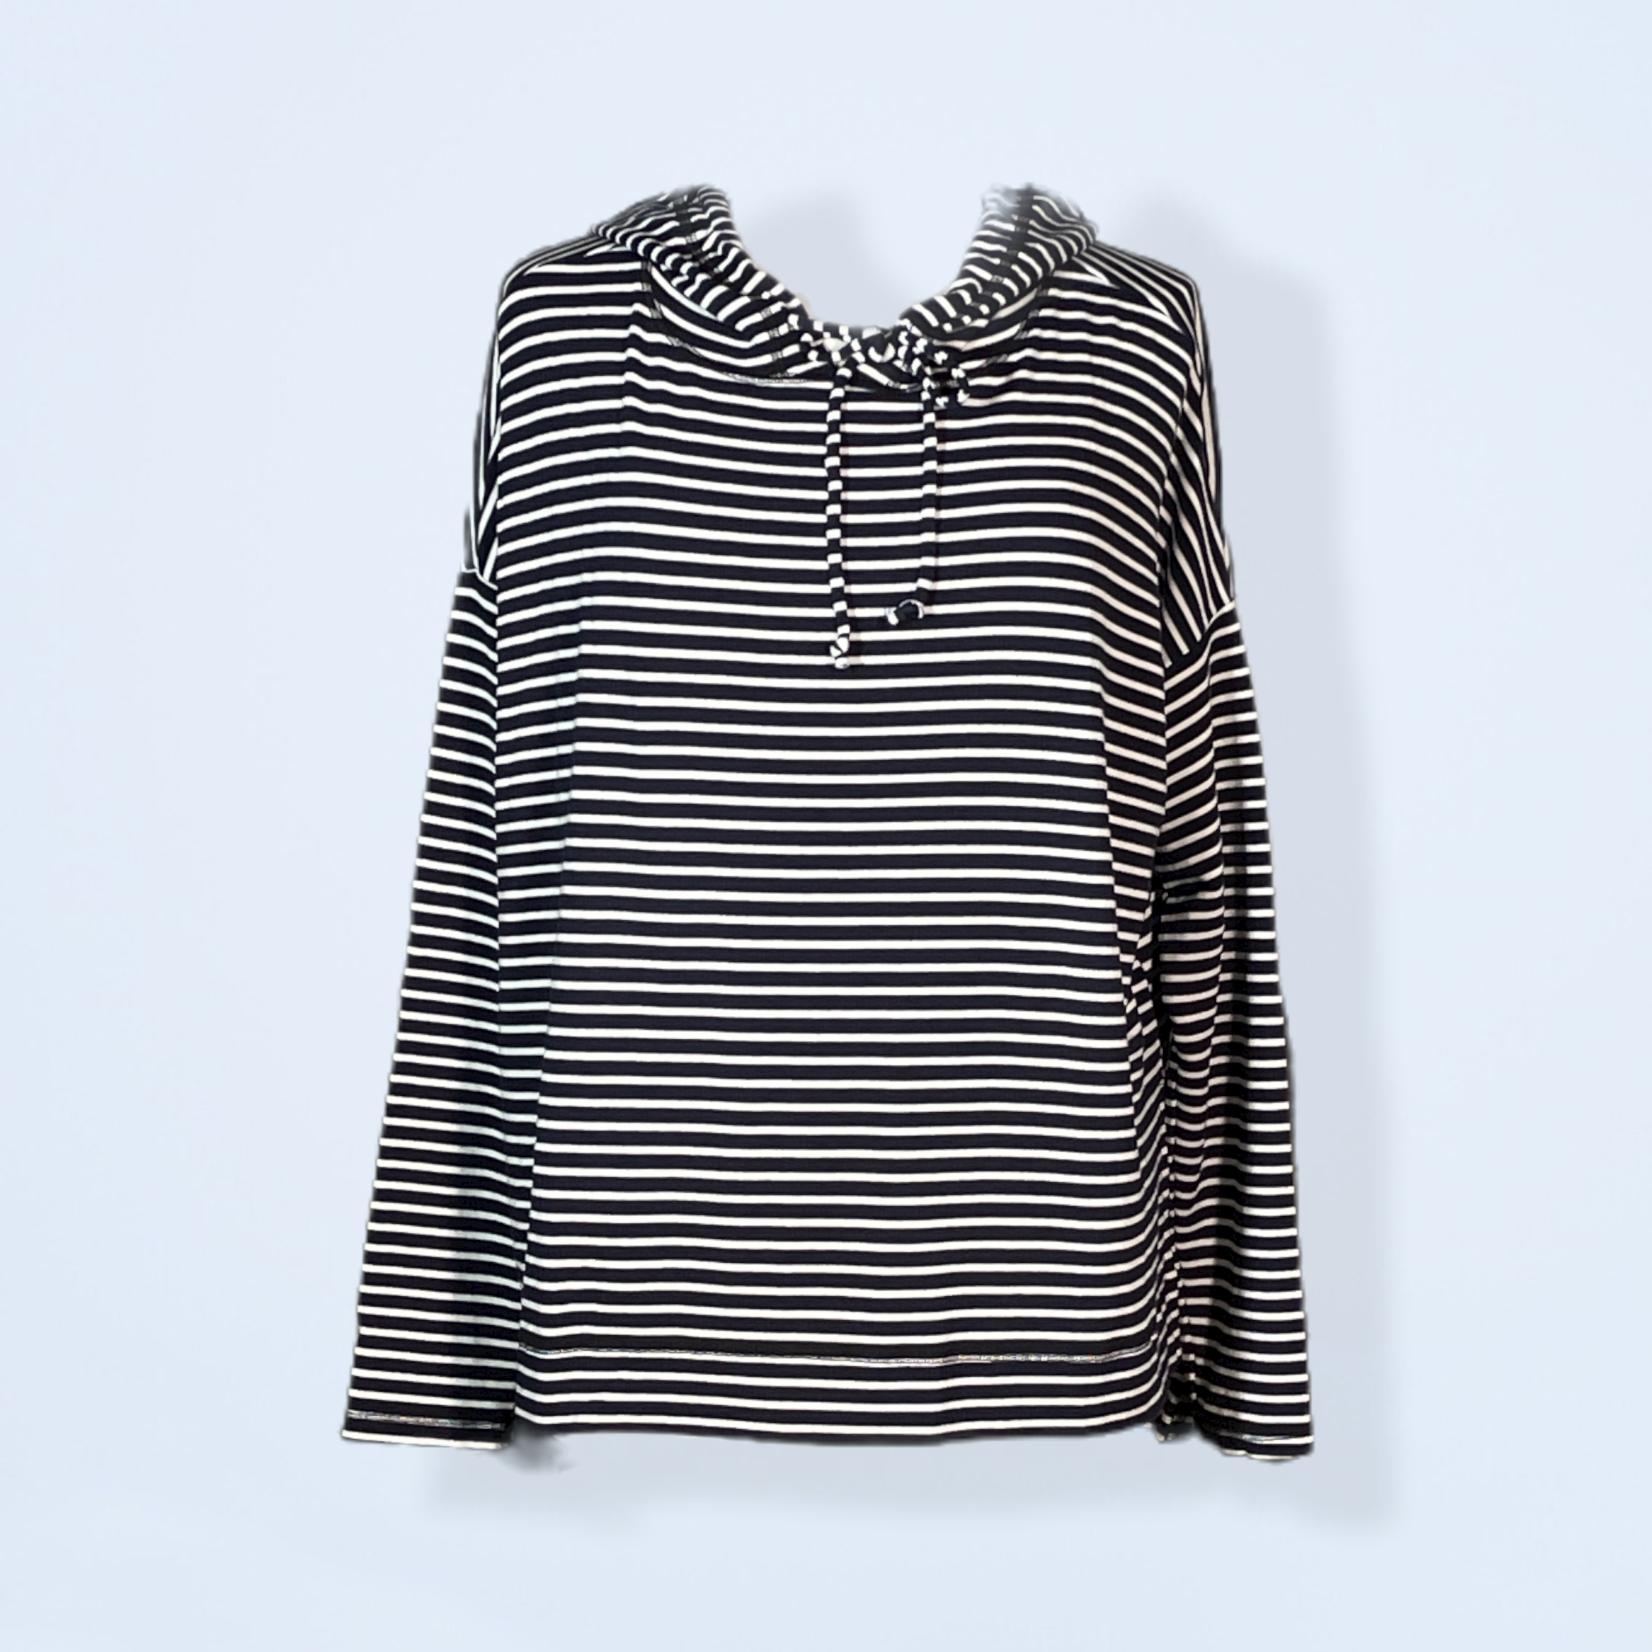 Navy Stripe Fleece Sweatshirt